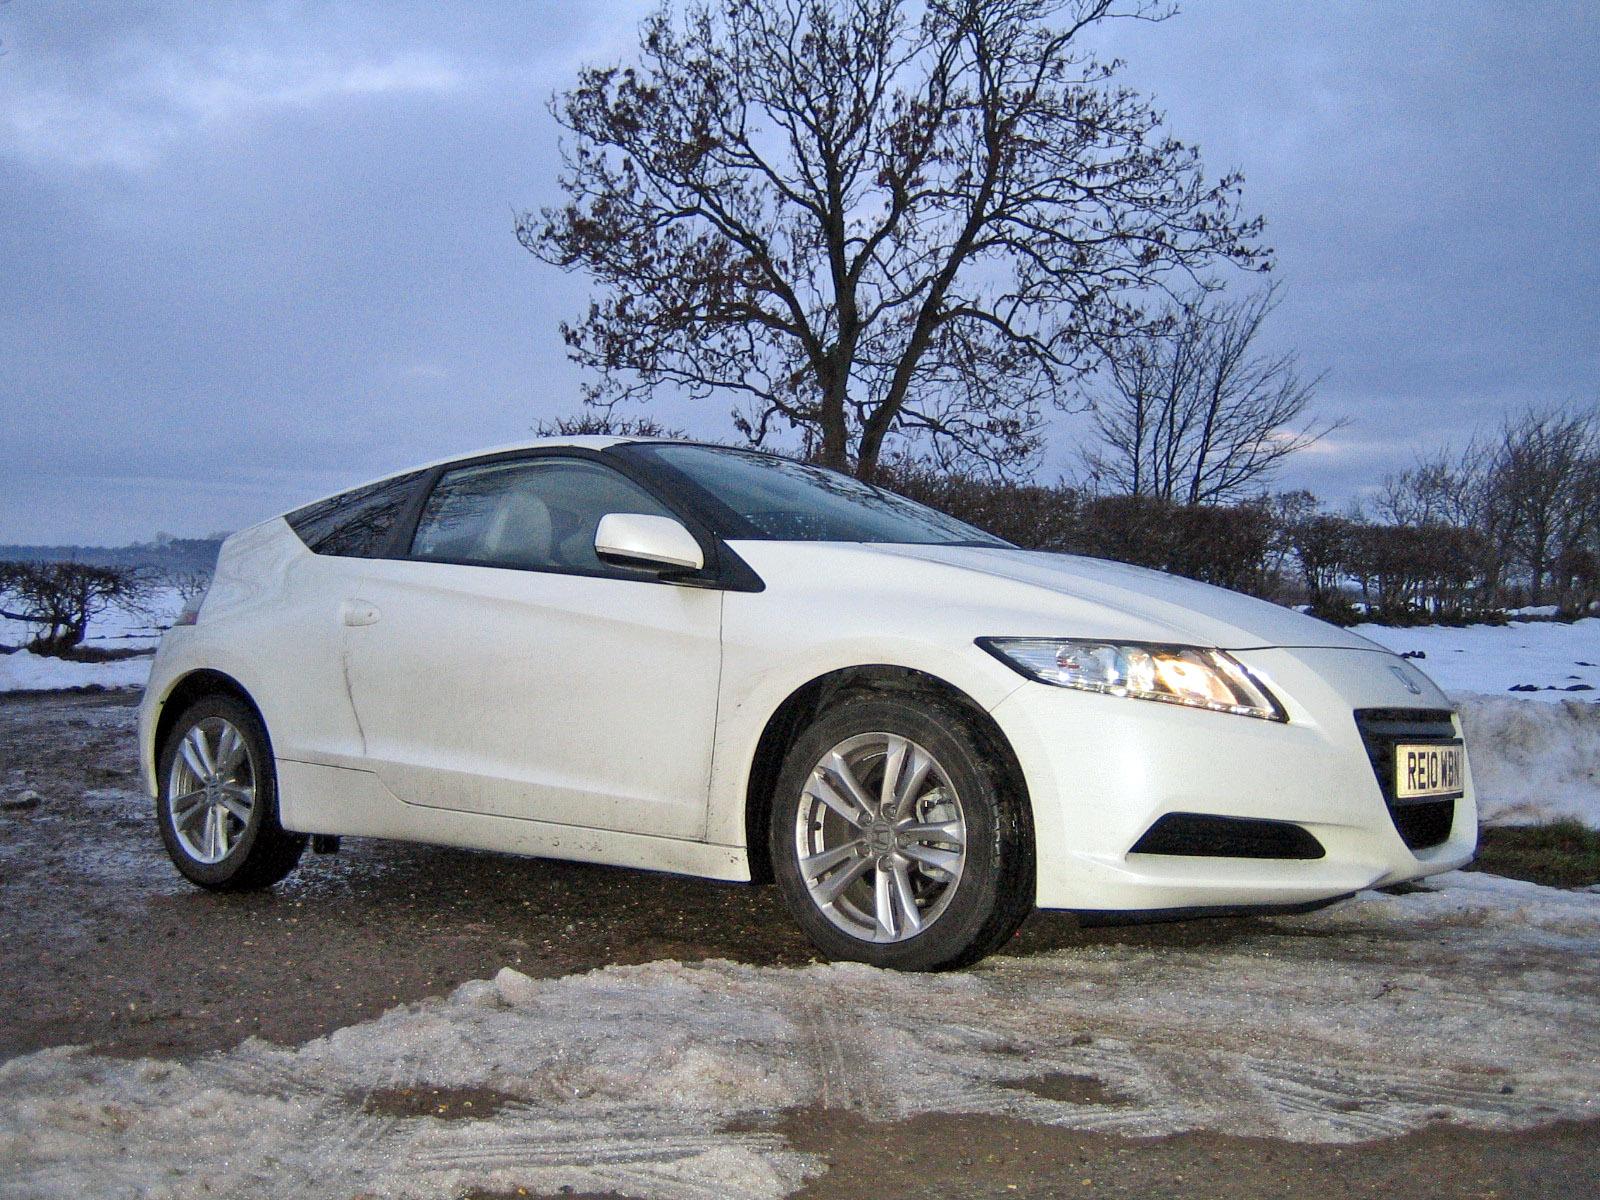 Hybrid Honda Fun To Drive But Lots To Consider Wheel World Reviews